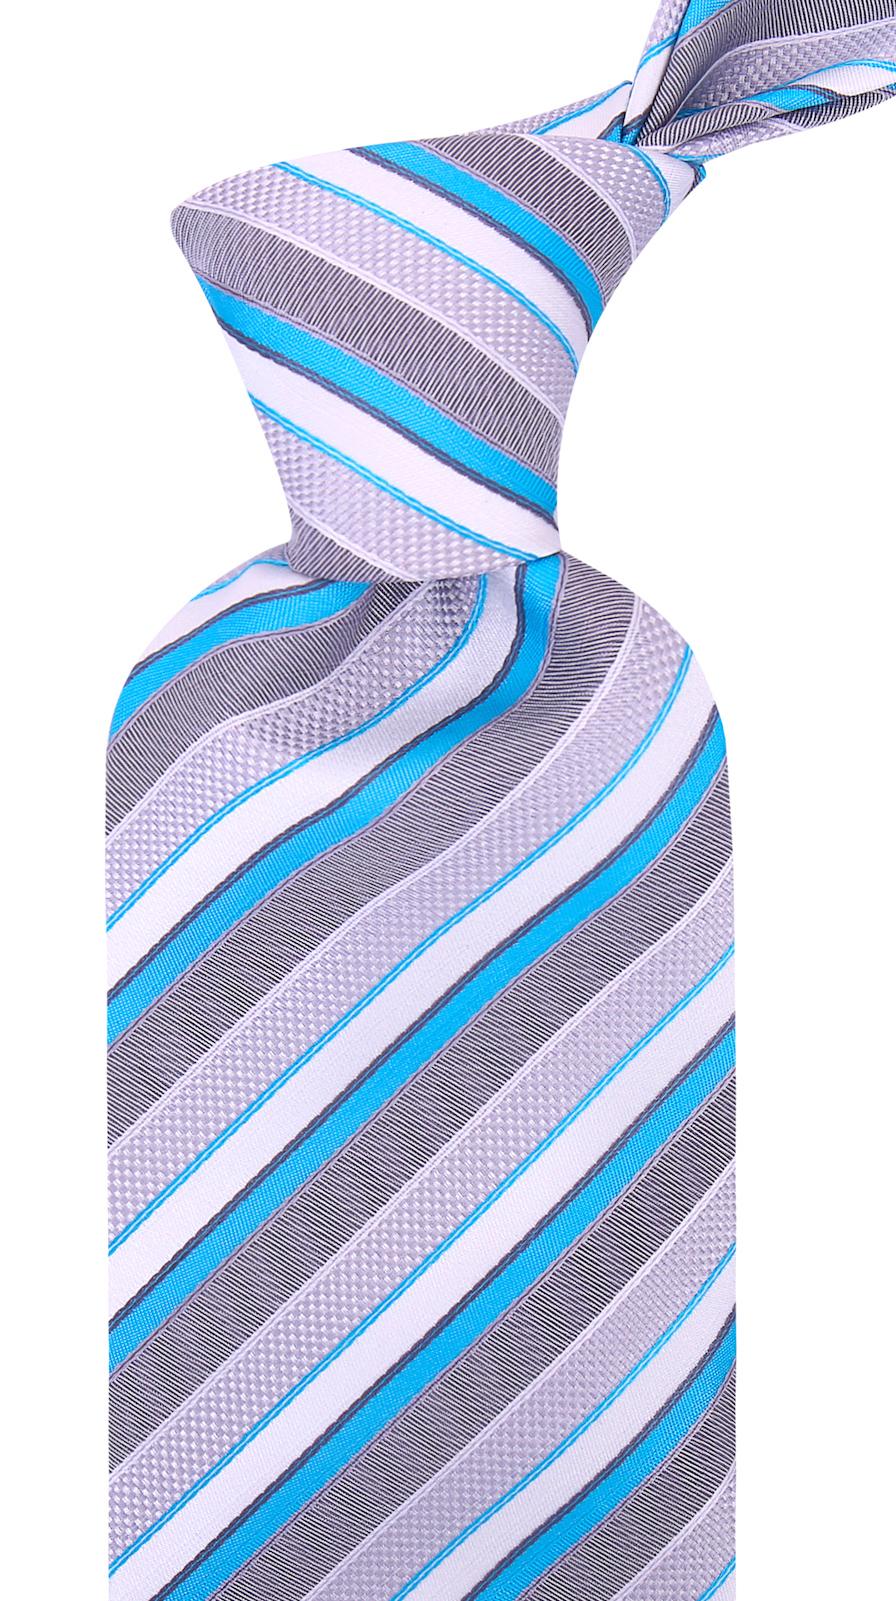 Scott-Allan-Striped-Necktie-Mens-Ties-in-Various-Colors thumbnail 35